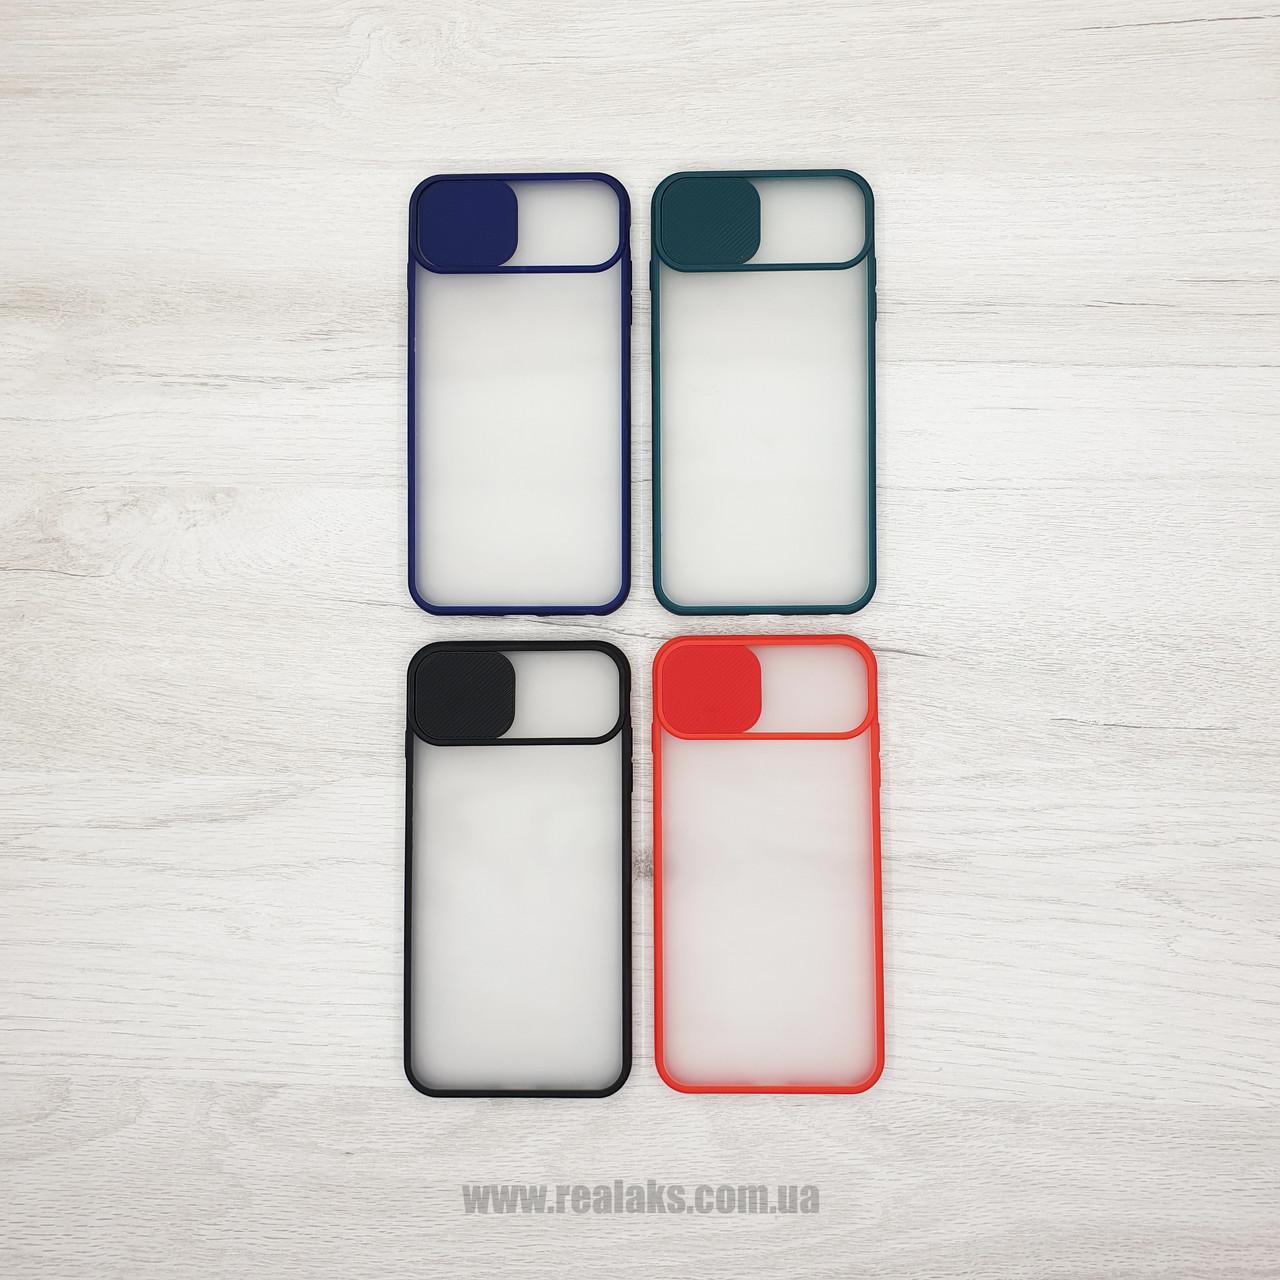 Чехол CASE для Apple iPhone 7Plus / 8Plus (шторка на камеру) color